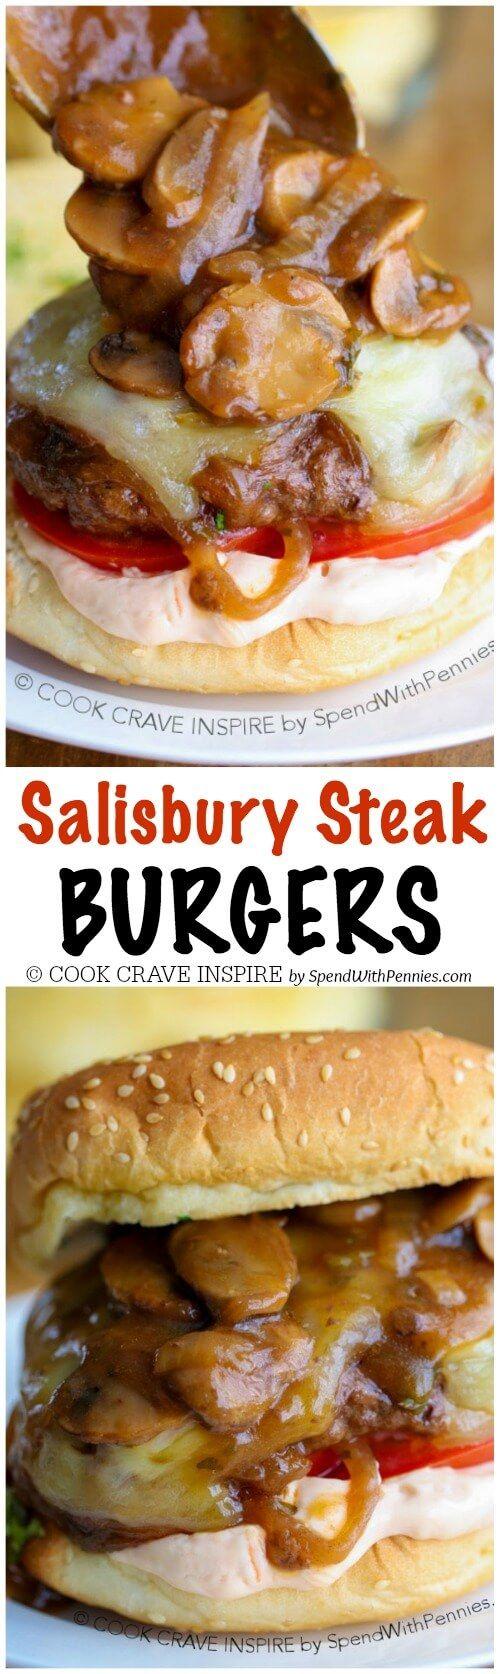 Easy gravy steak recipes